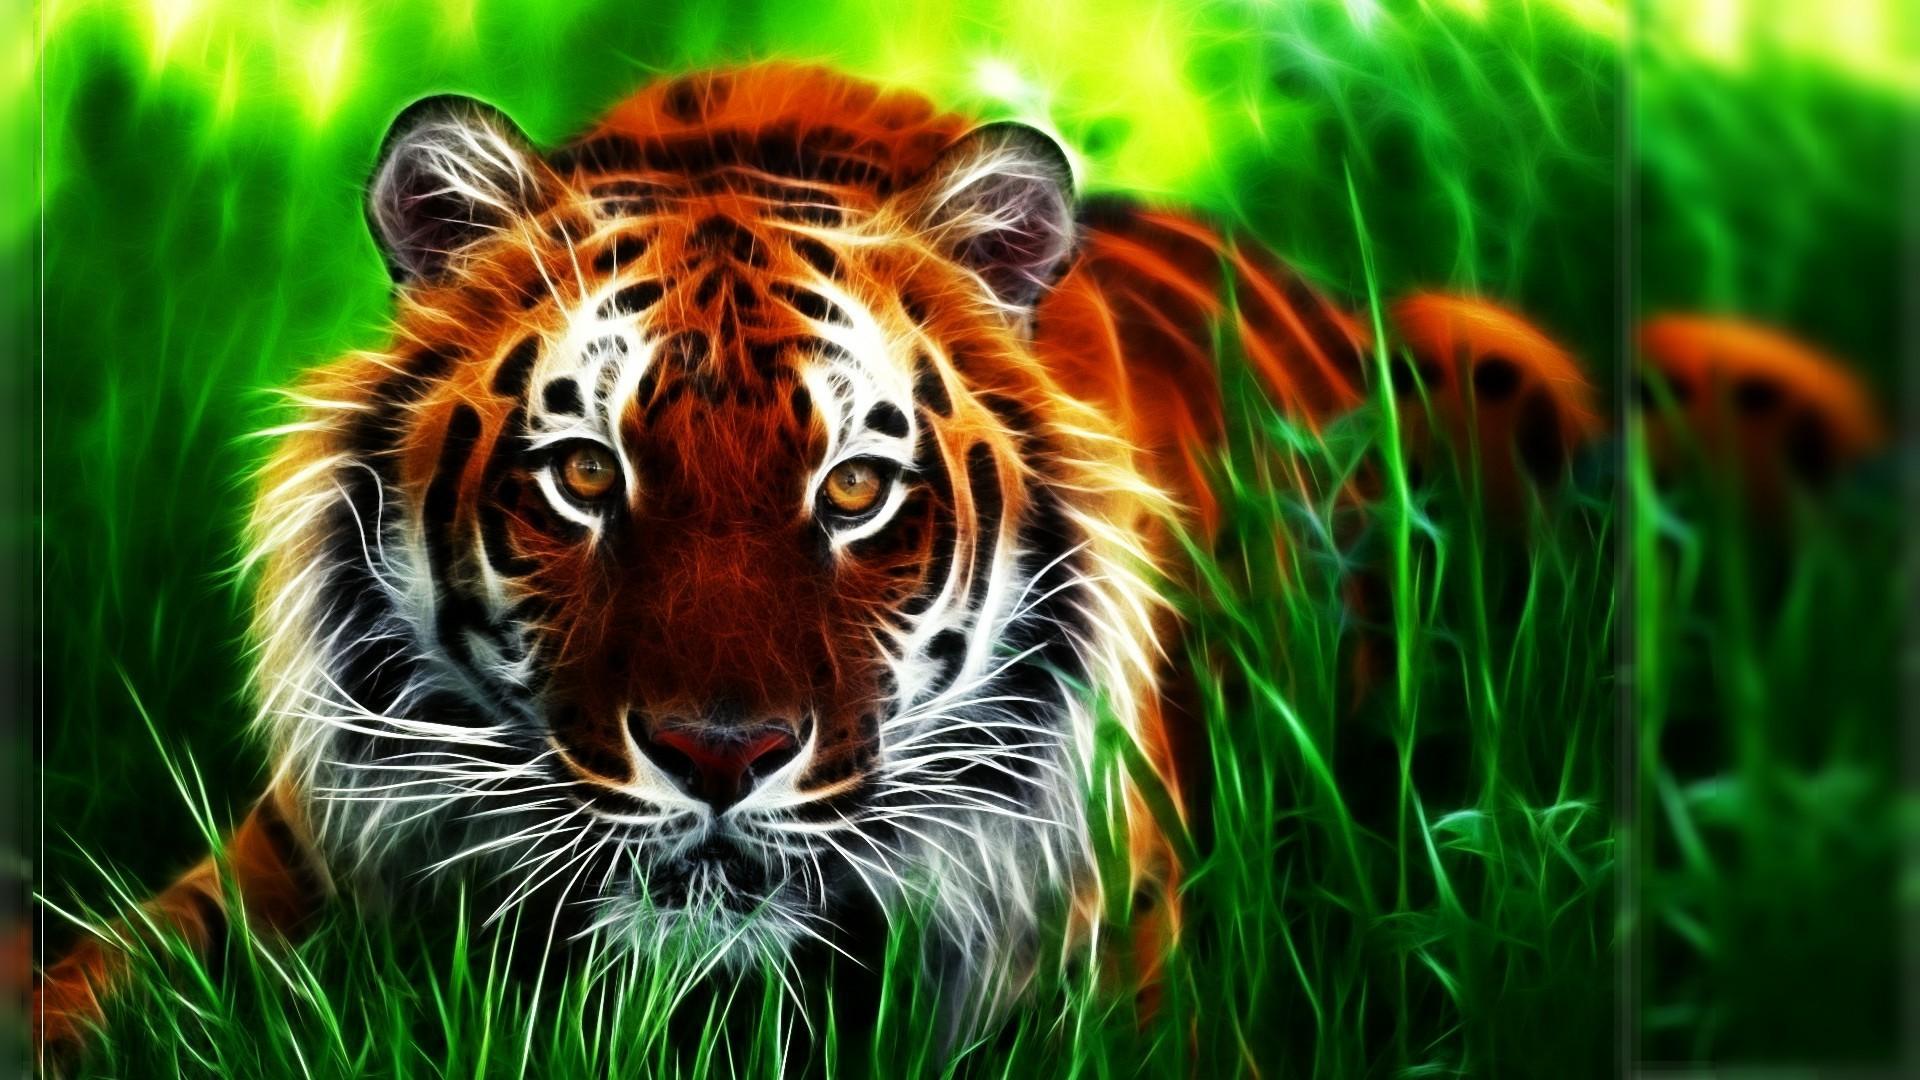 D Tiger Photoshop fractal wallpaper 960×640 Green Tiger Wallpapers (43  Wallpapers) |